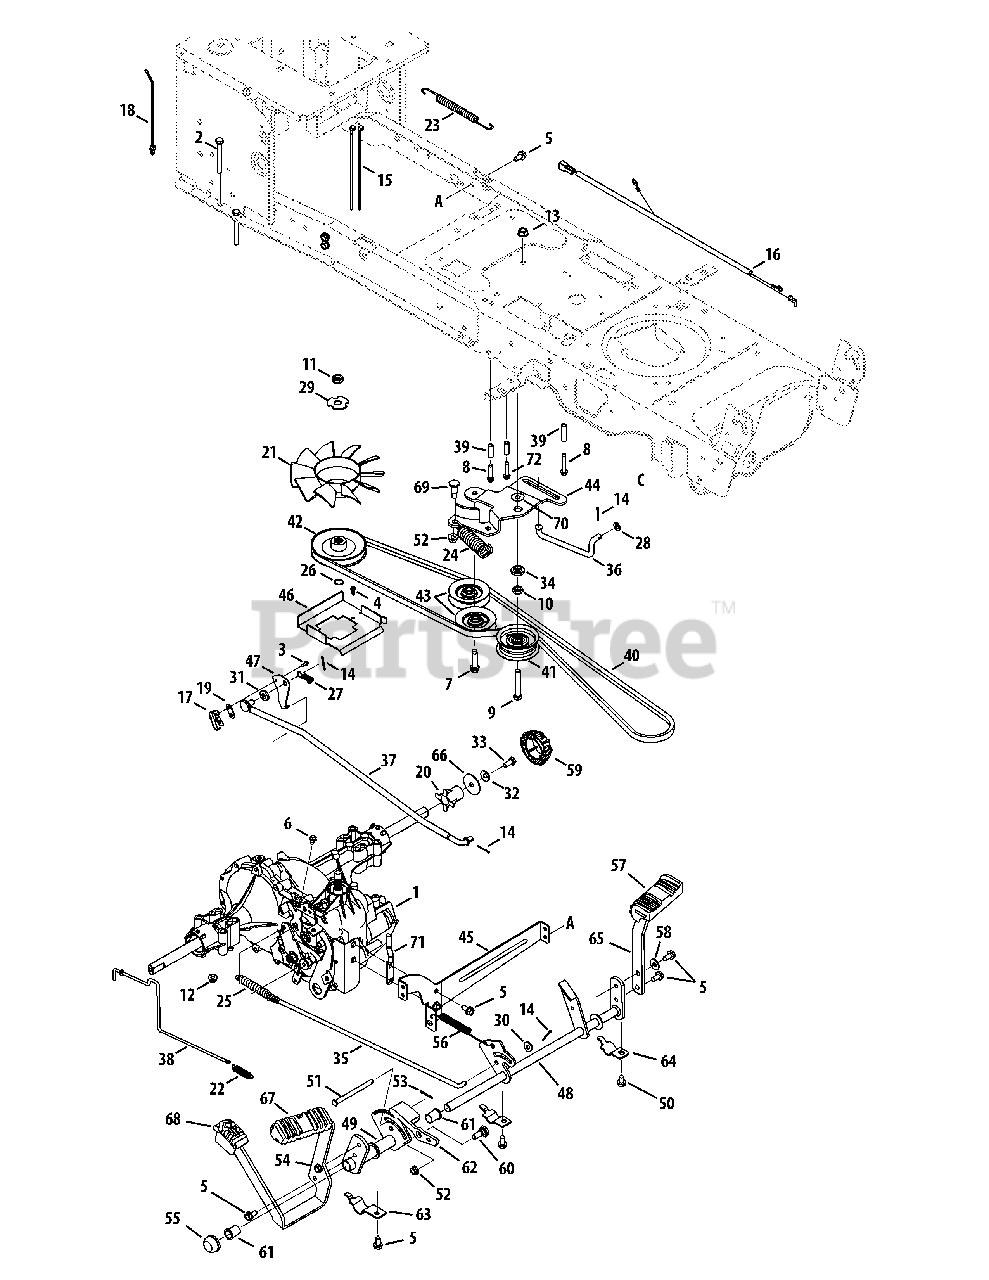 [DIAGRAM] Wiring Diagram For Cub Cadet Ltx 1050 FULL